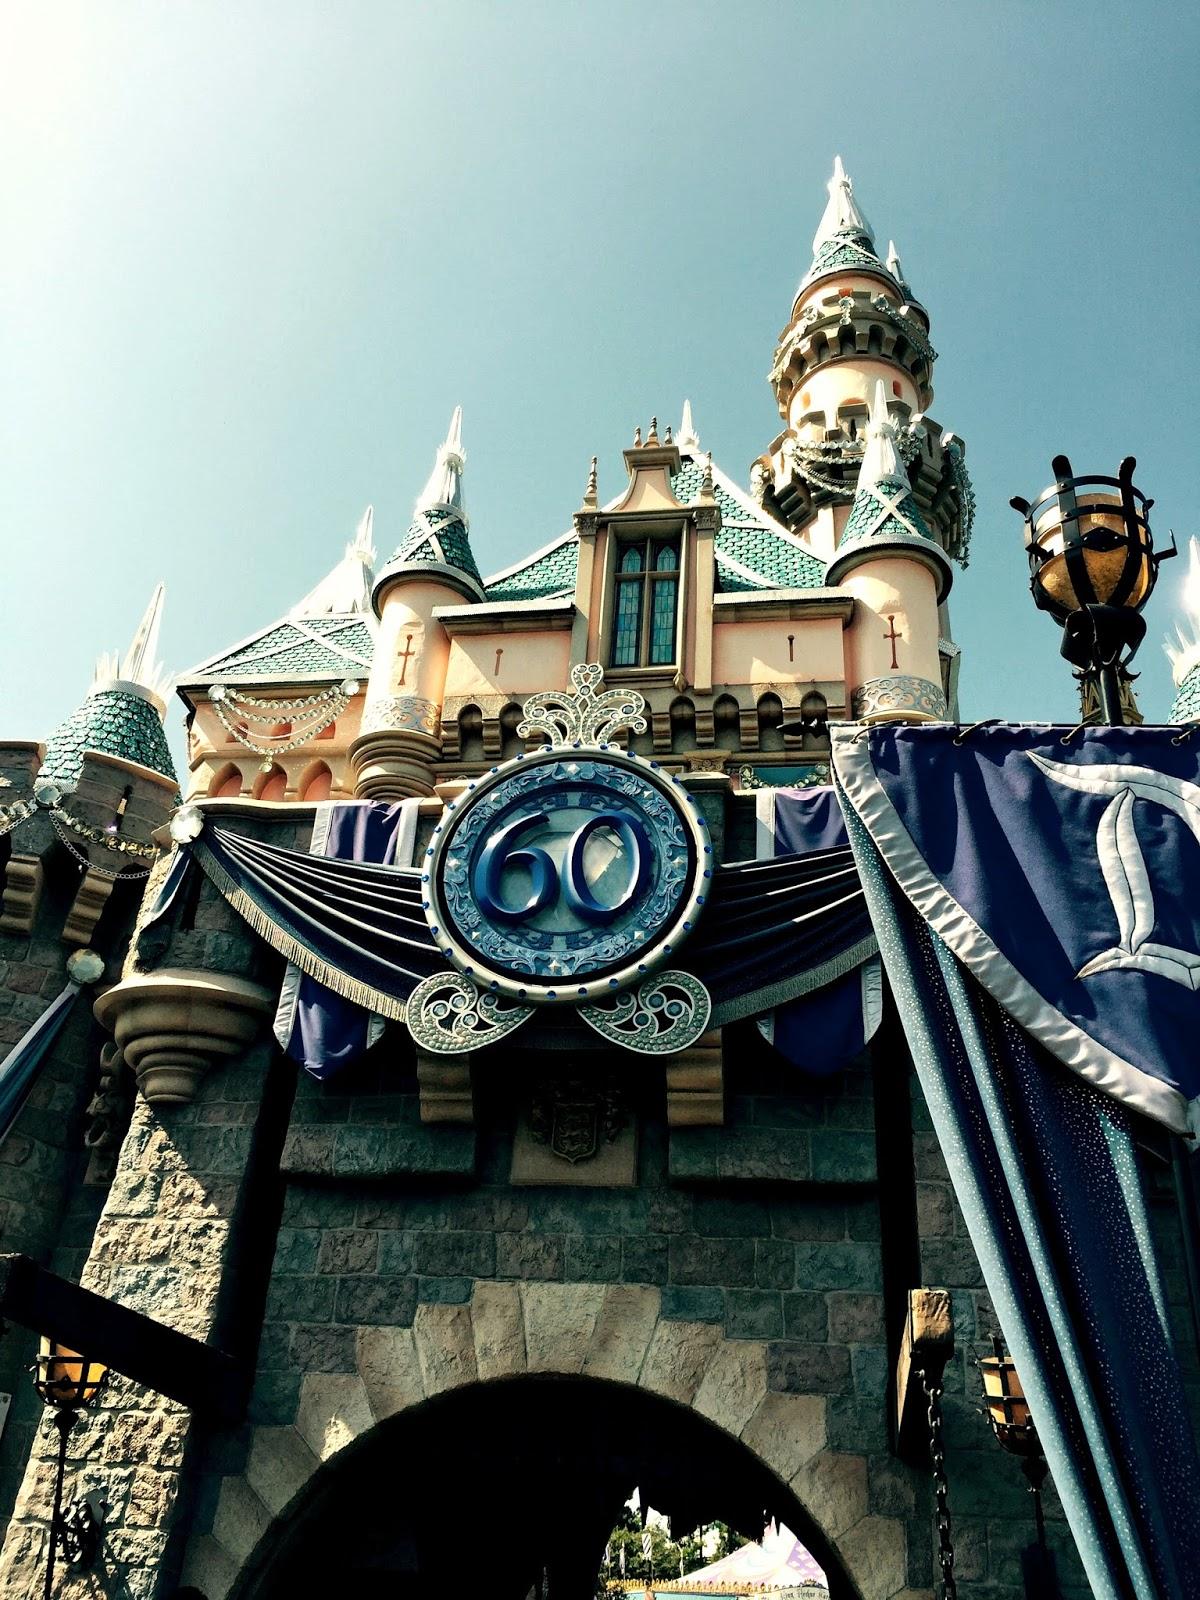 Disneyland diamond celebration sweepstakes word of the day 2018